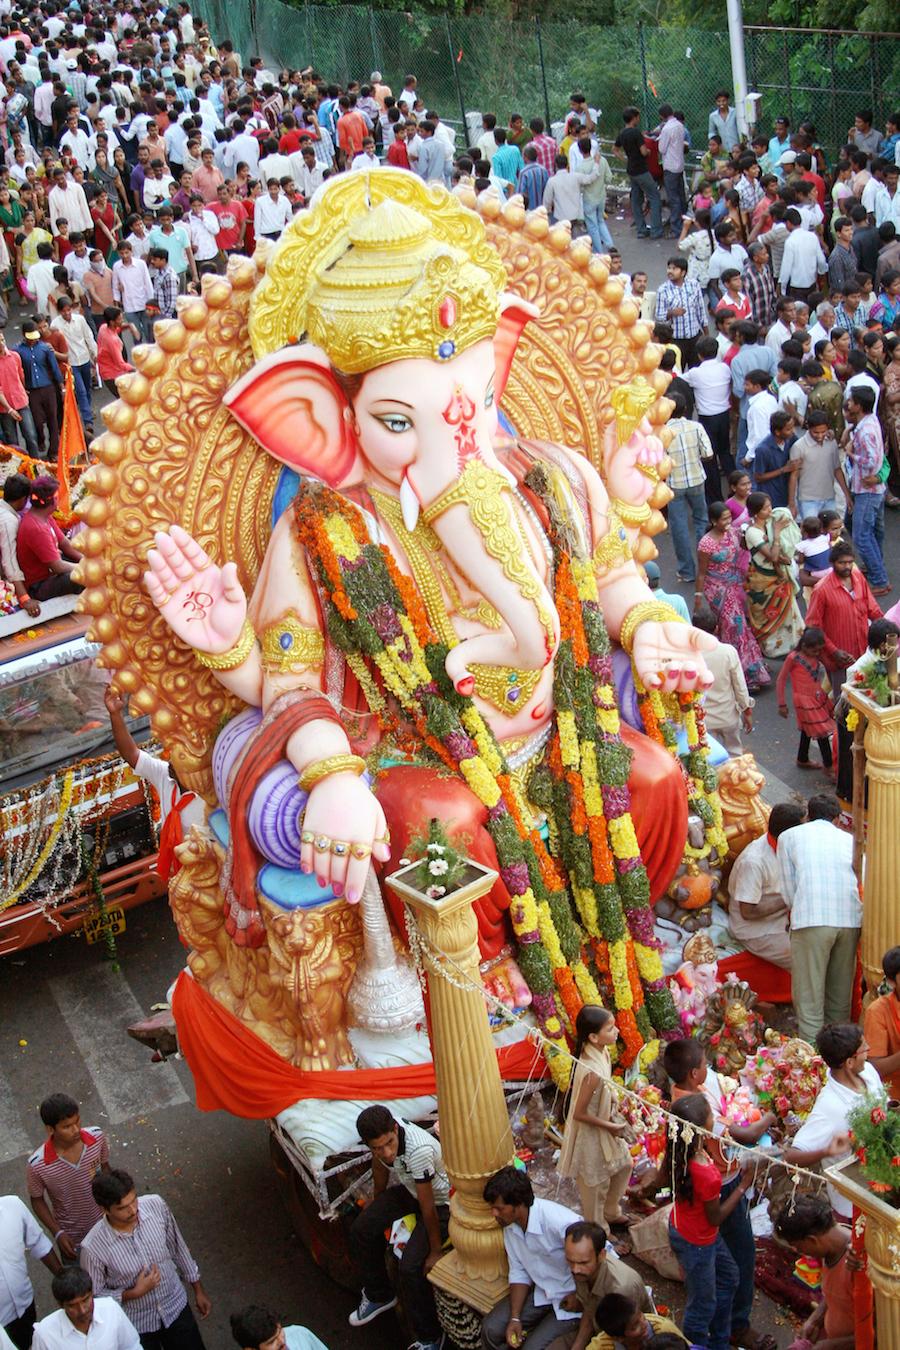 Ganesh statue being transported © reddees / Shutterstock.com